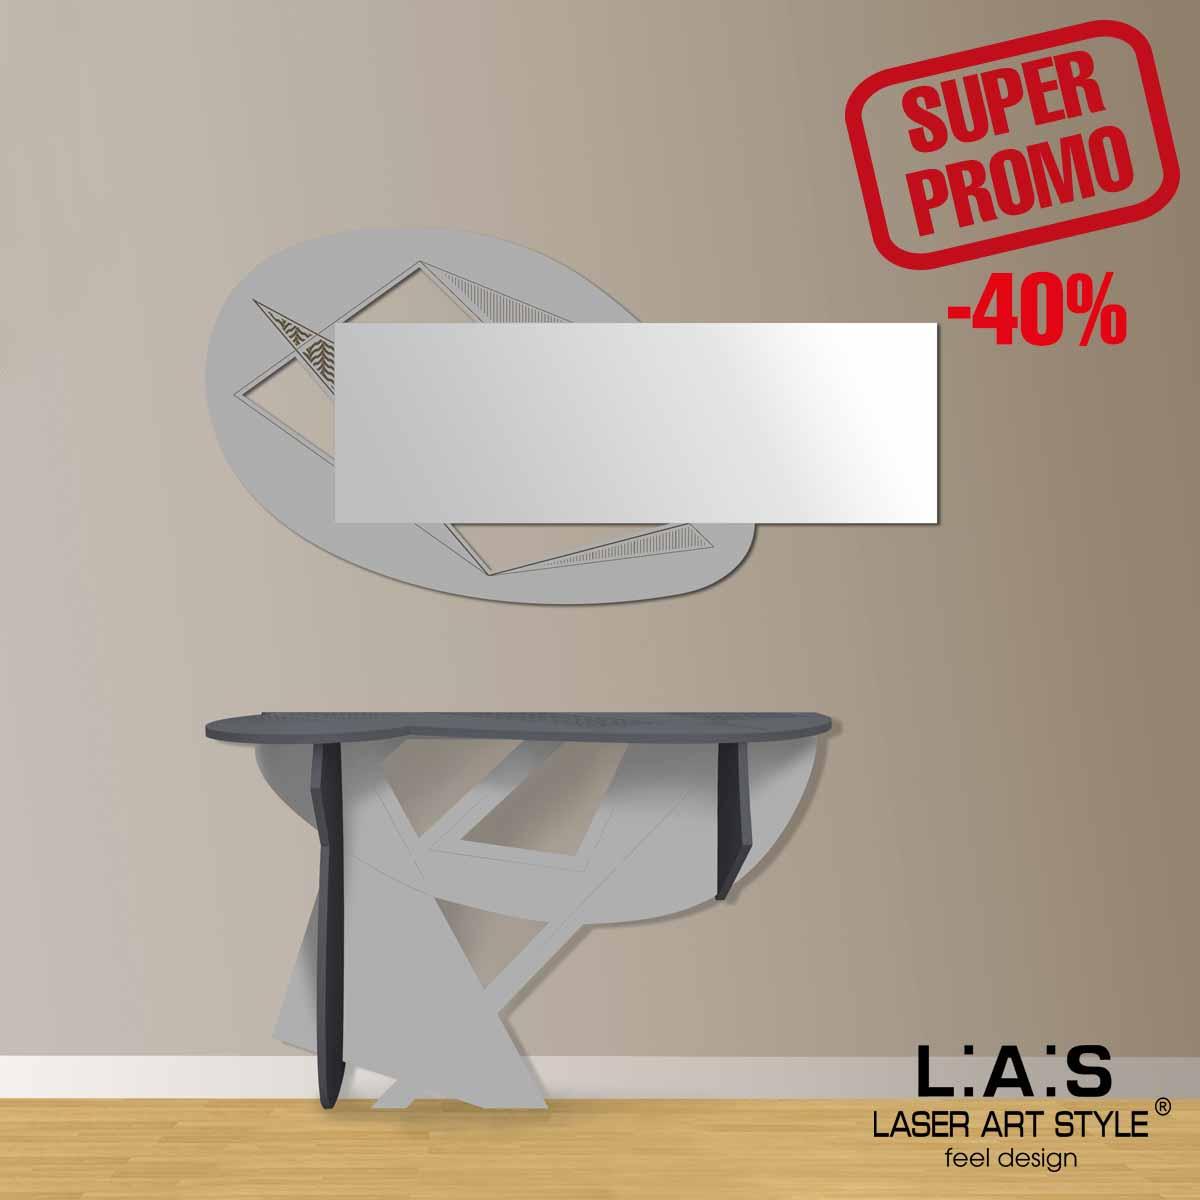 L:A:S - Laser Art Style - CONSOLLE INGRESSO DESIGN SCANDINAVO – SI-382 ANTRACITE-CEMENTO